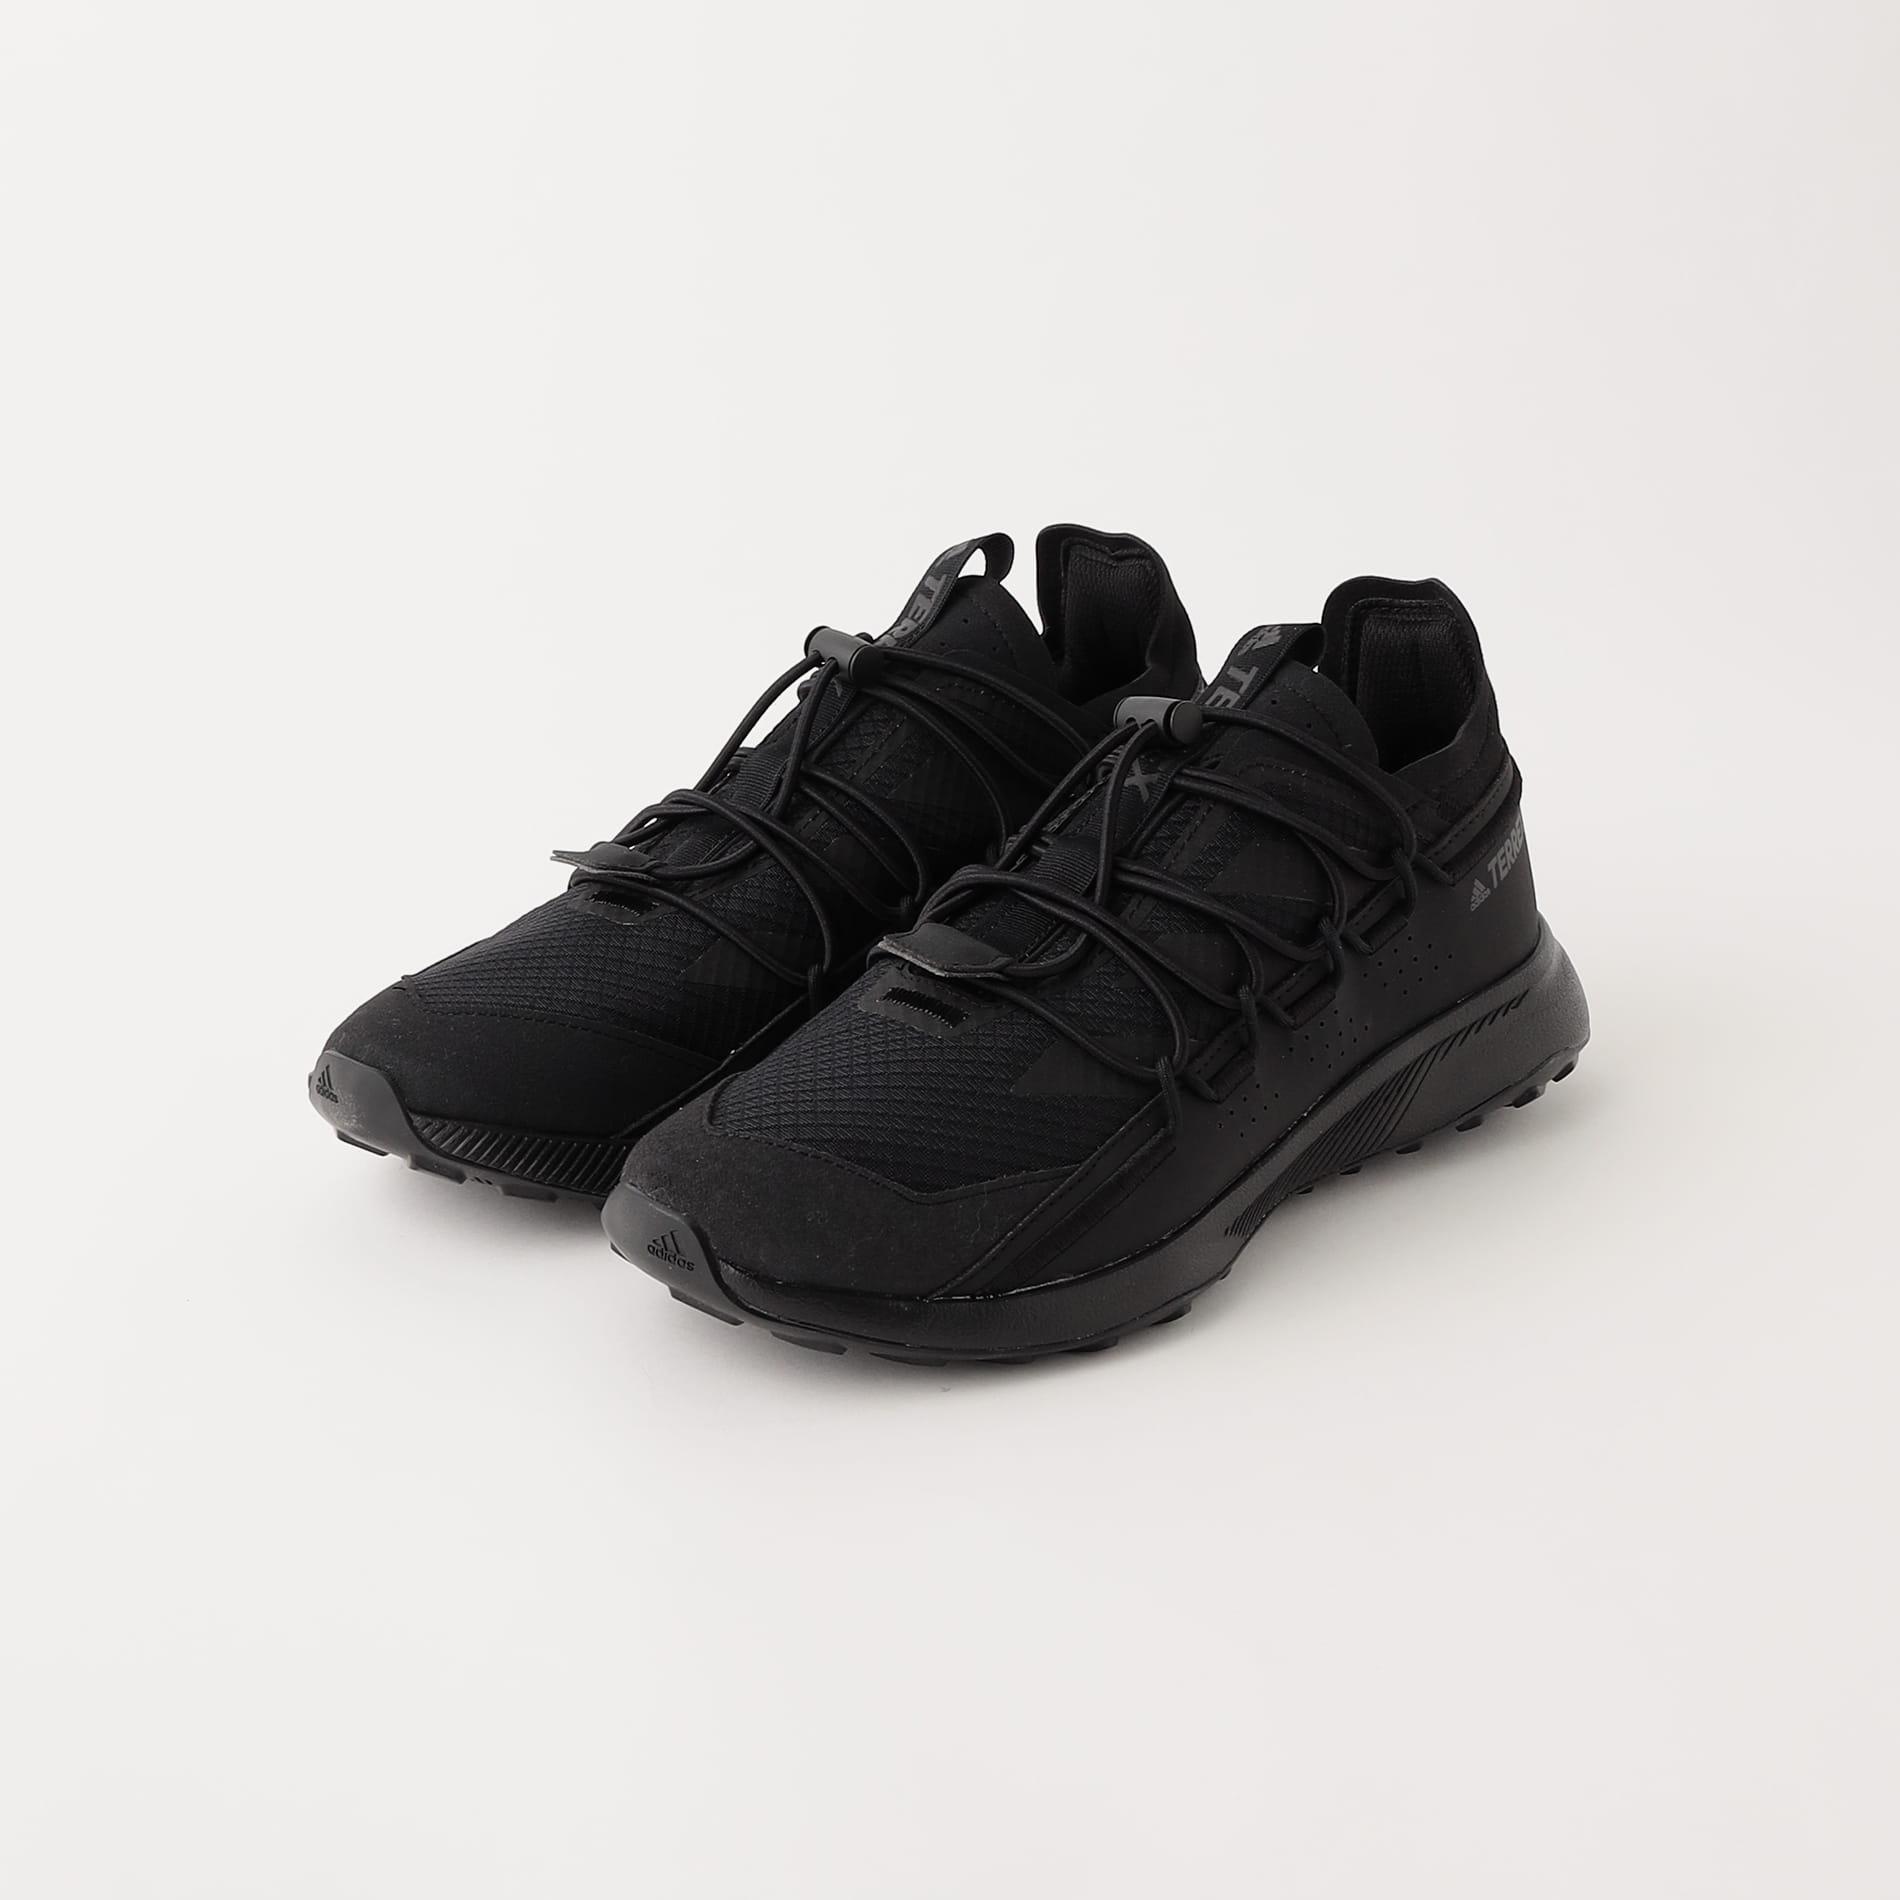 【adidas】MEN スニーカー TERREX VOYAGER 21 H.RDY H0537